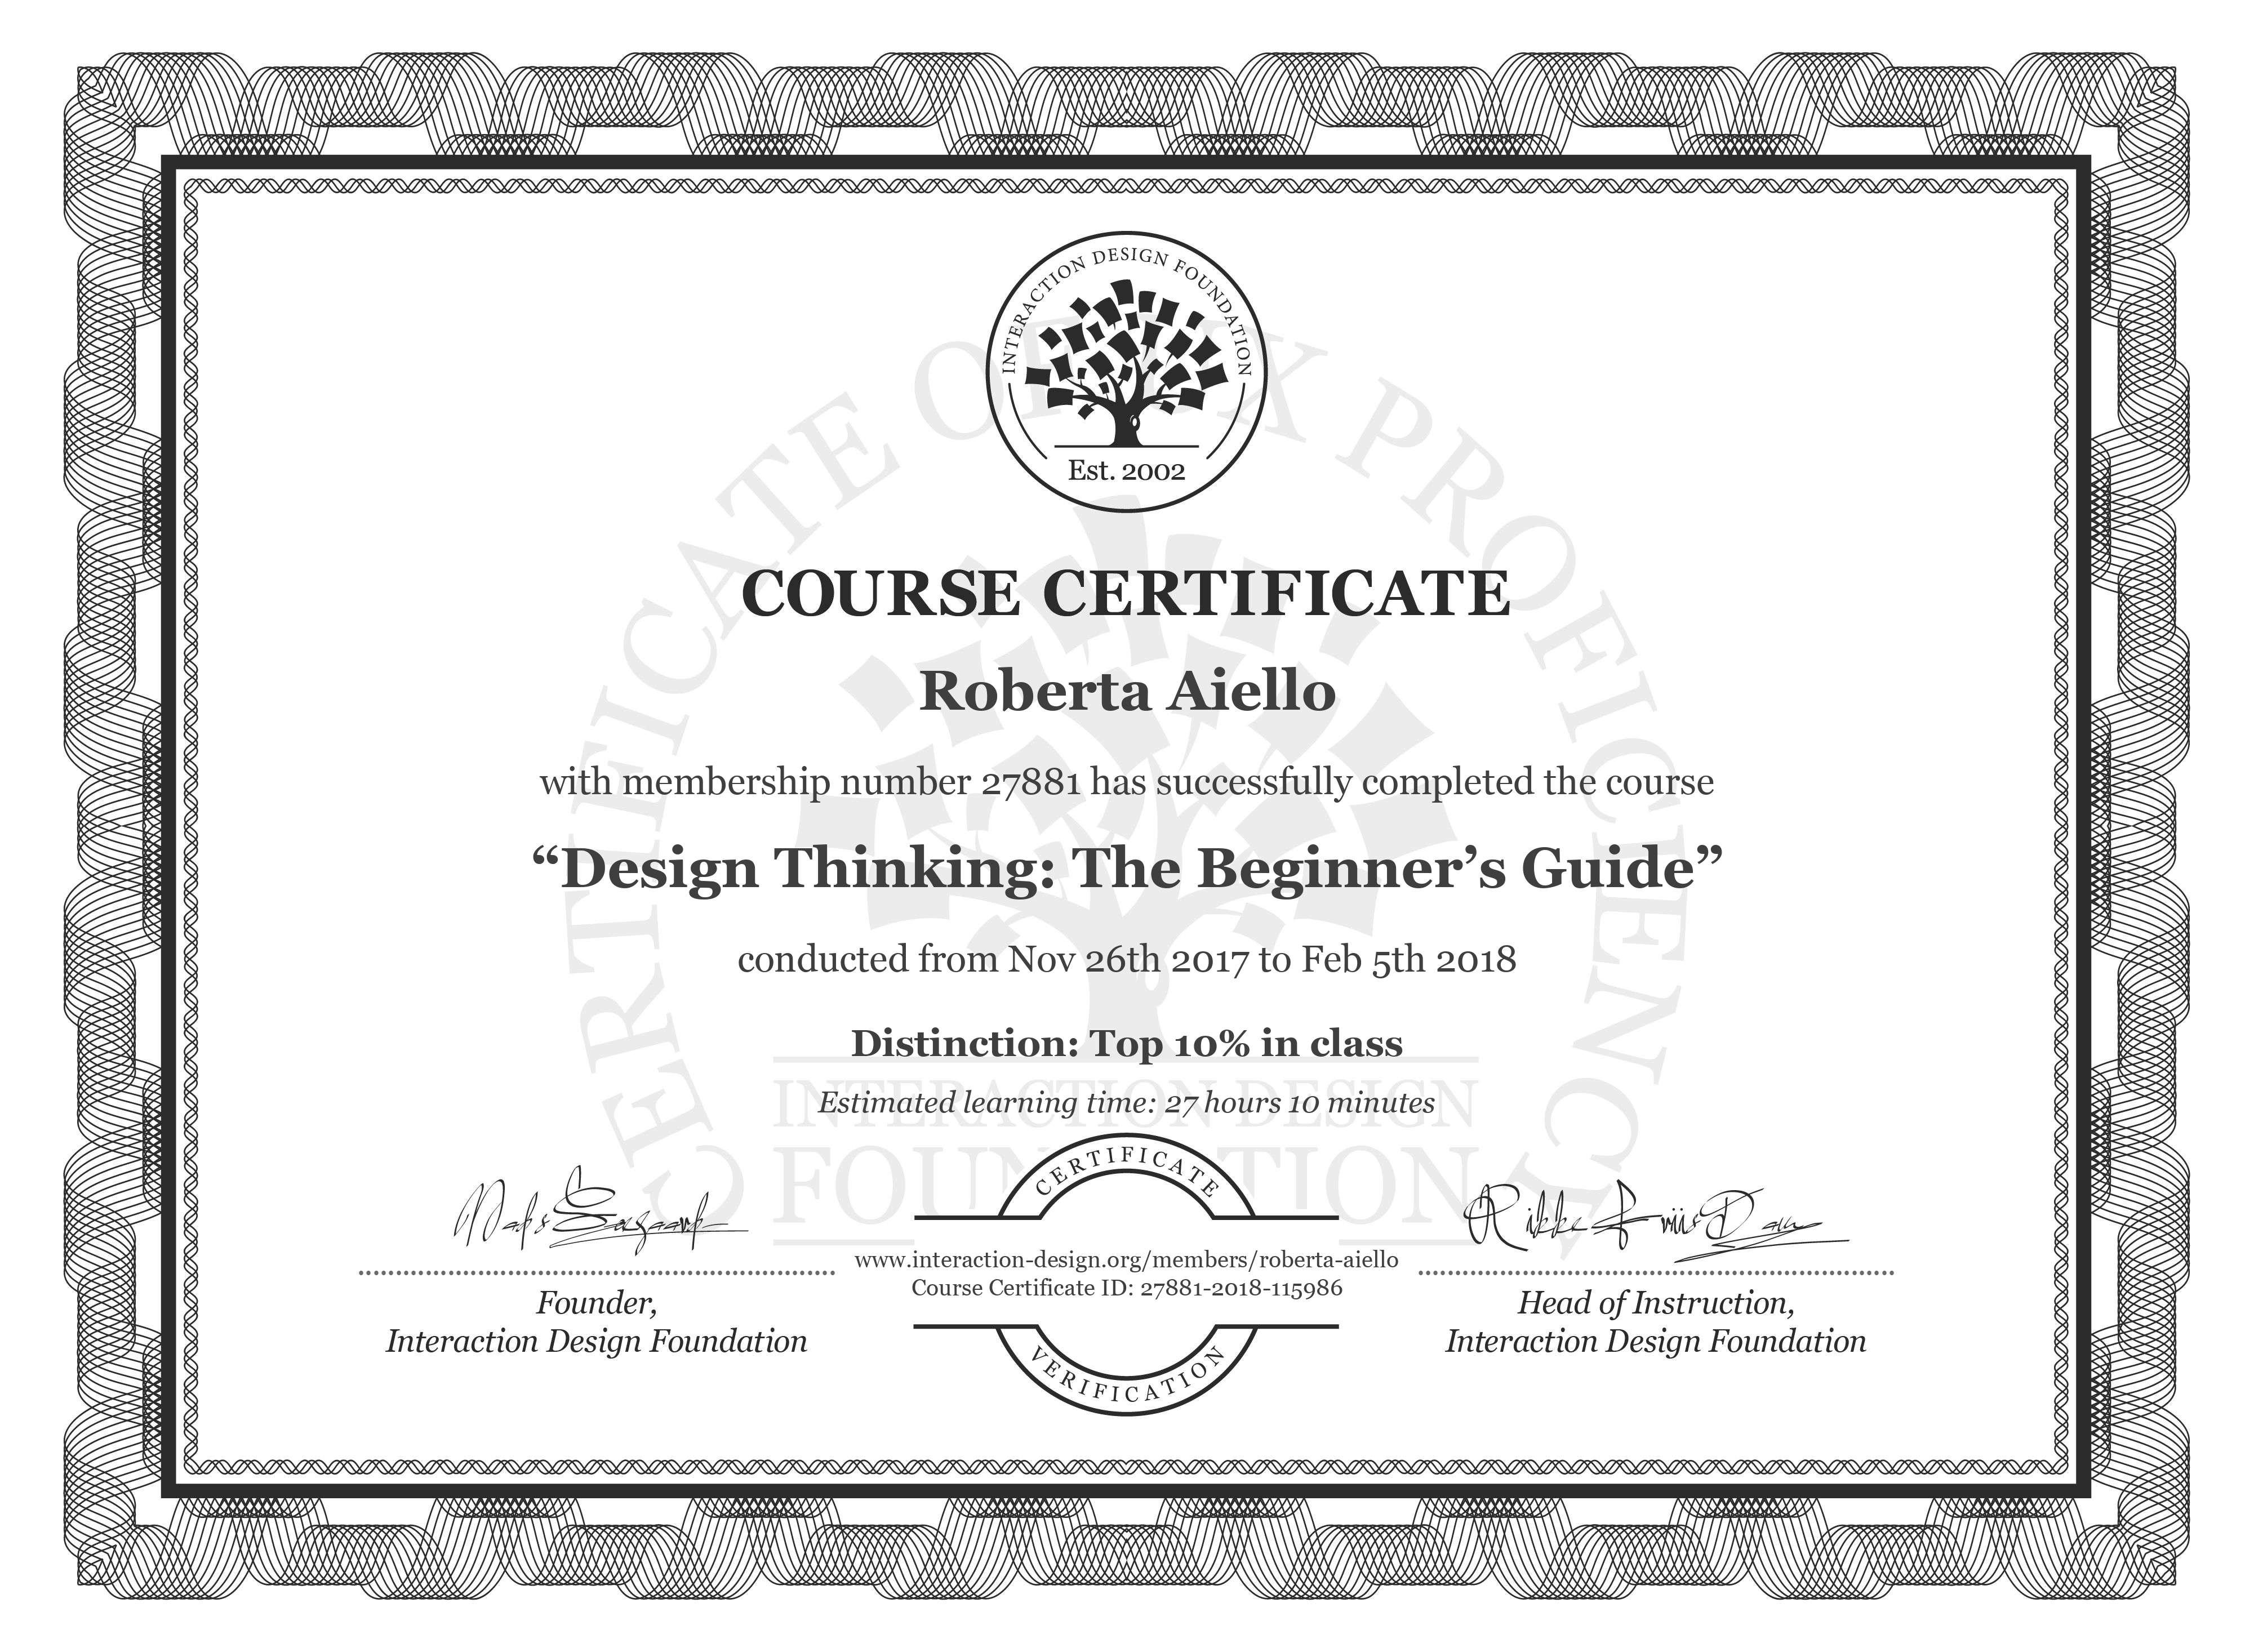 Roberta Aiello: Course Certificate - Design Thinking: The Beginner's Guide